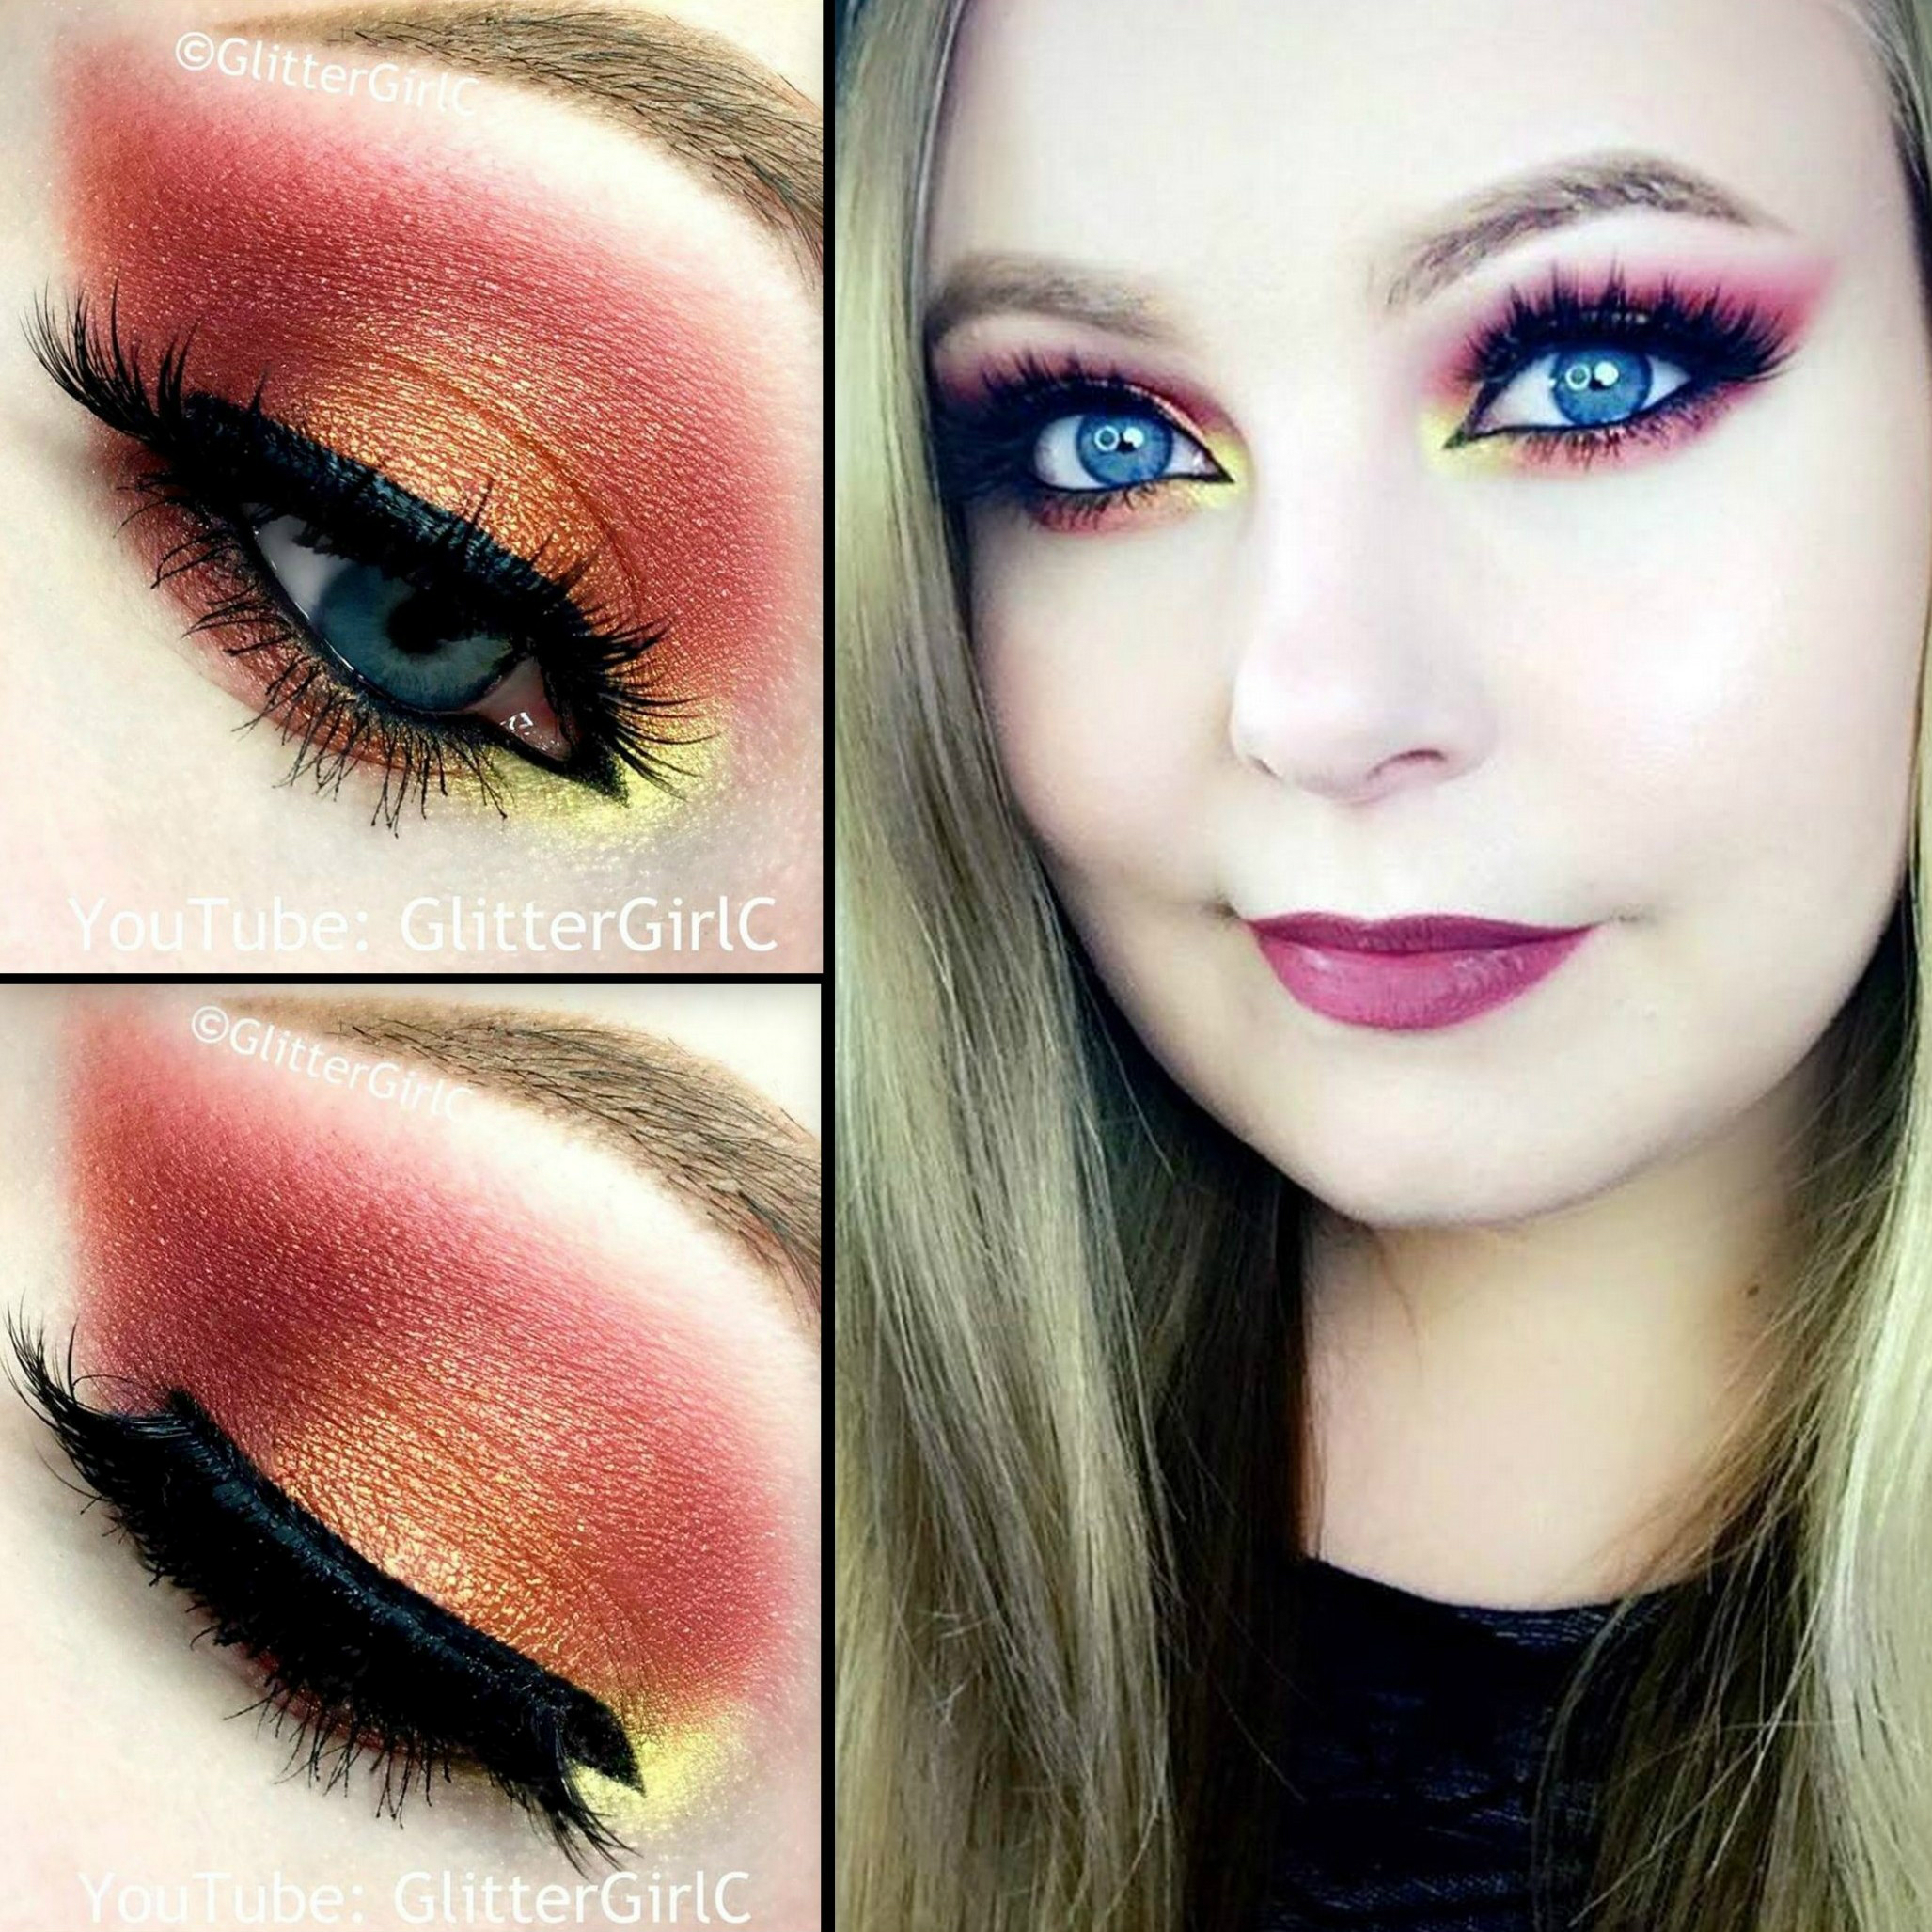 Kat Von D Mi Vida Loca Makeup Look Glittergirlc